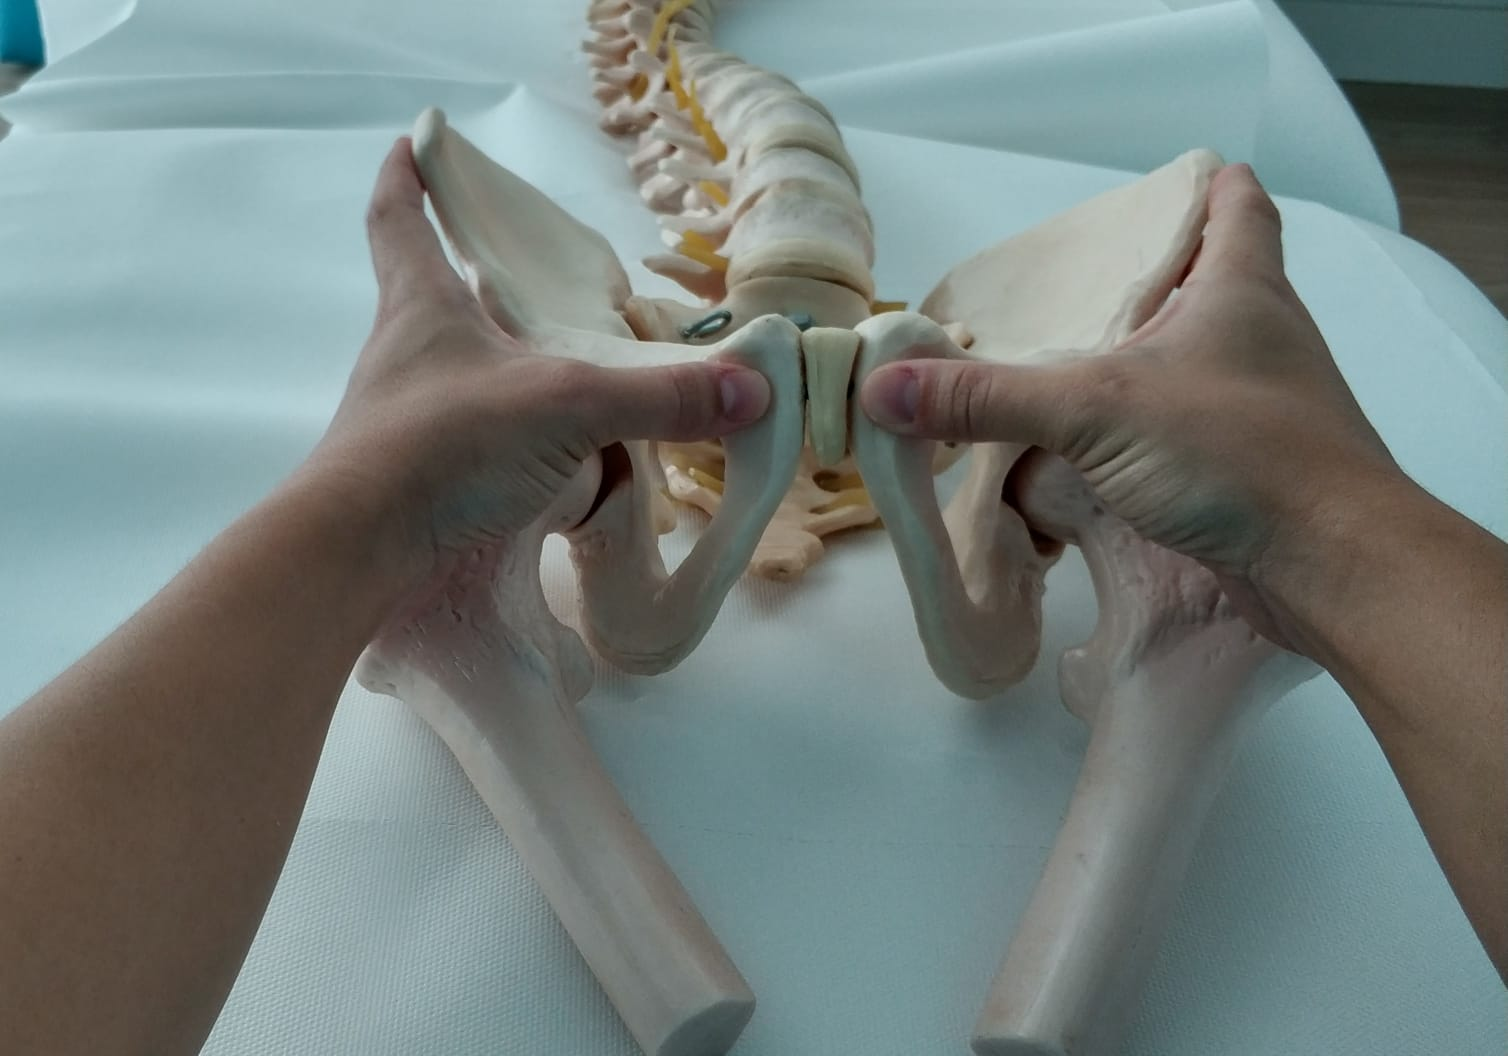 Terapia manual dolor pelvico crónico mujer